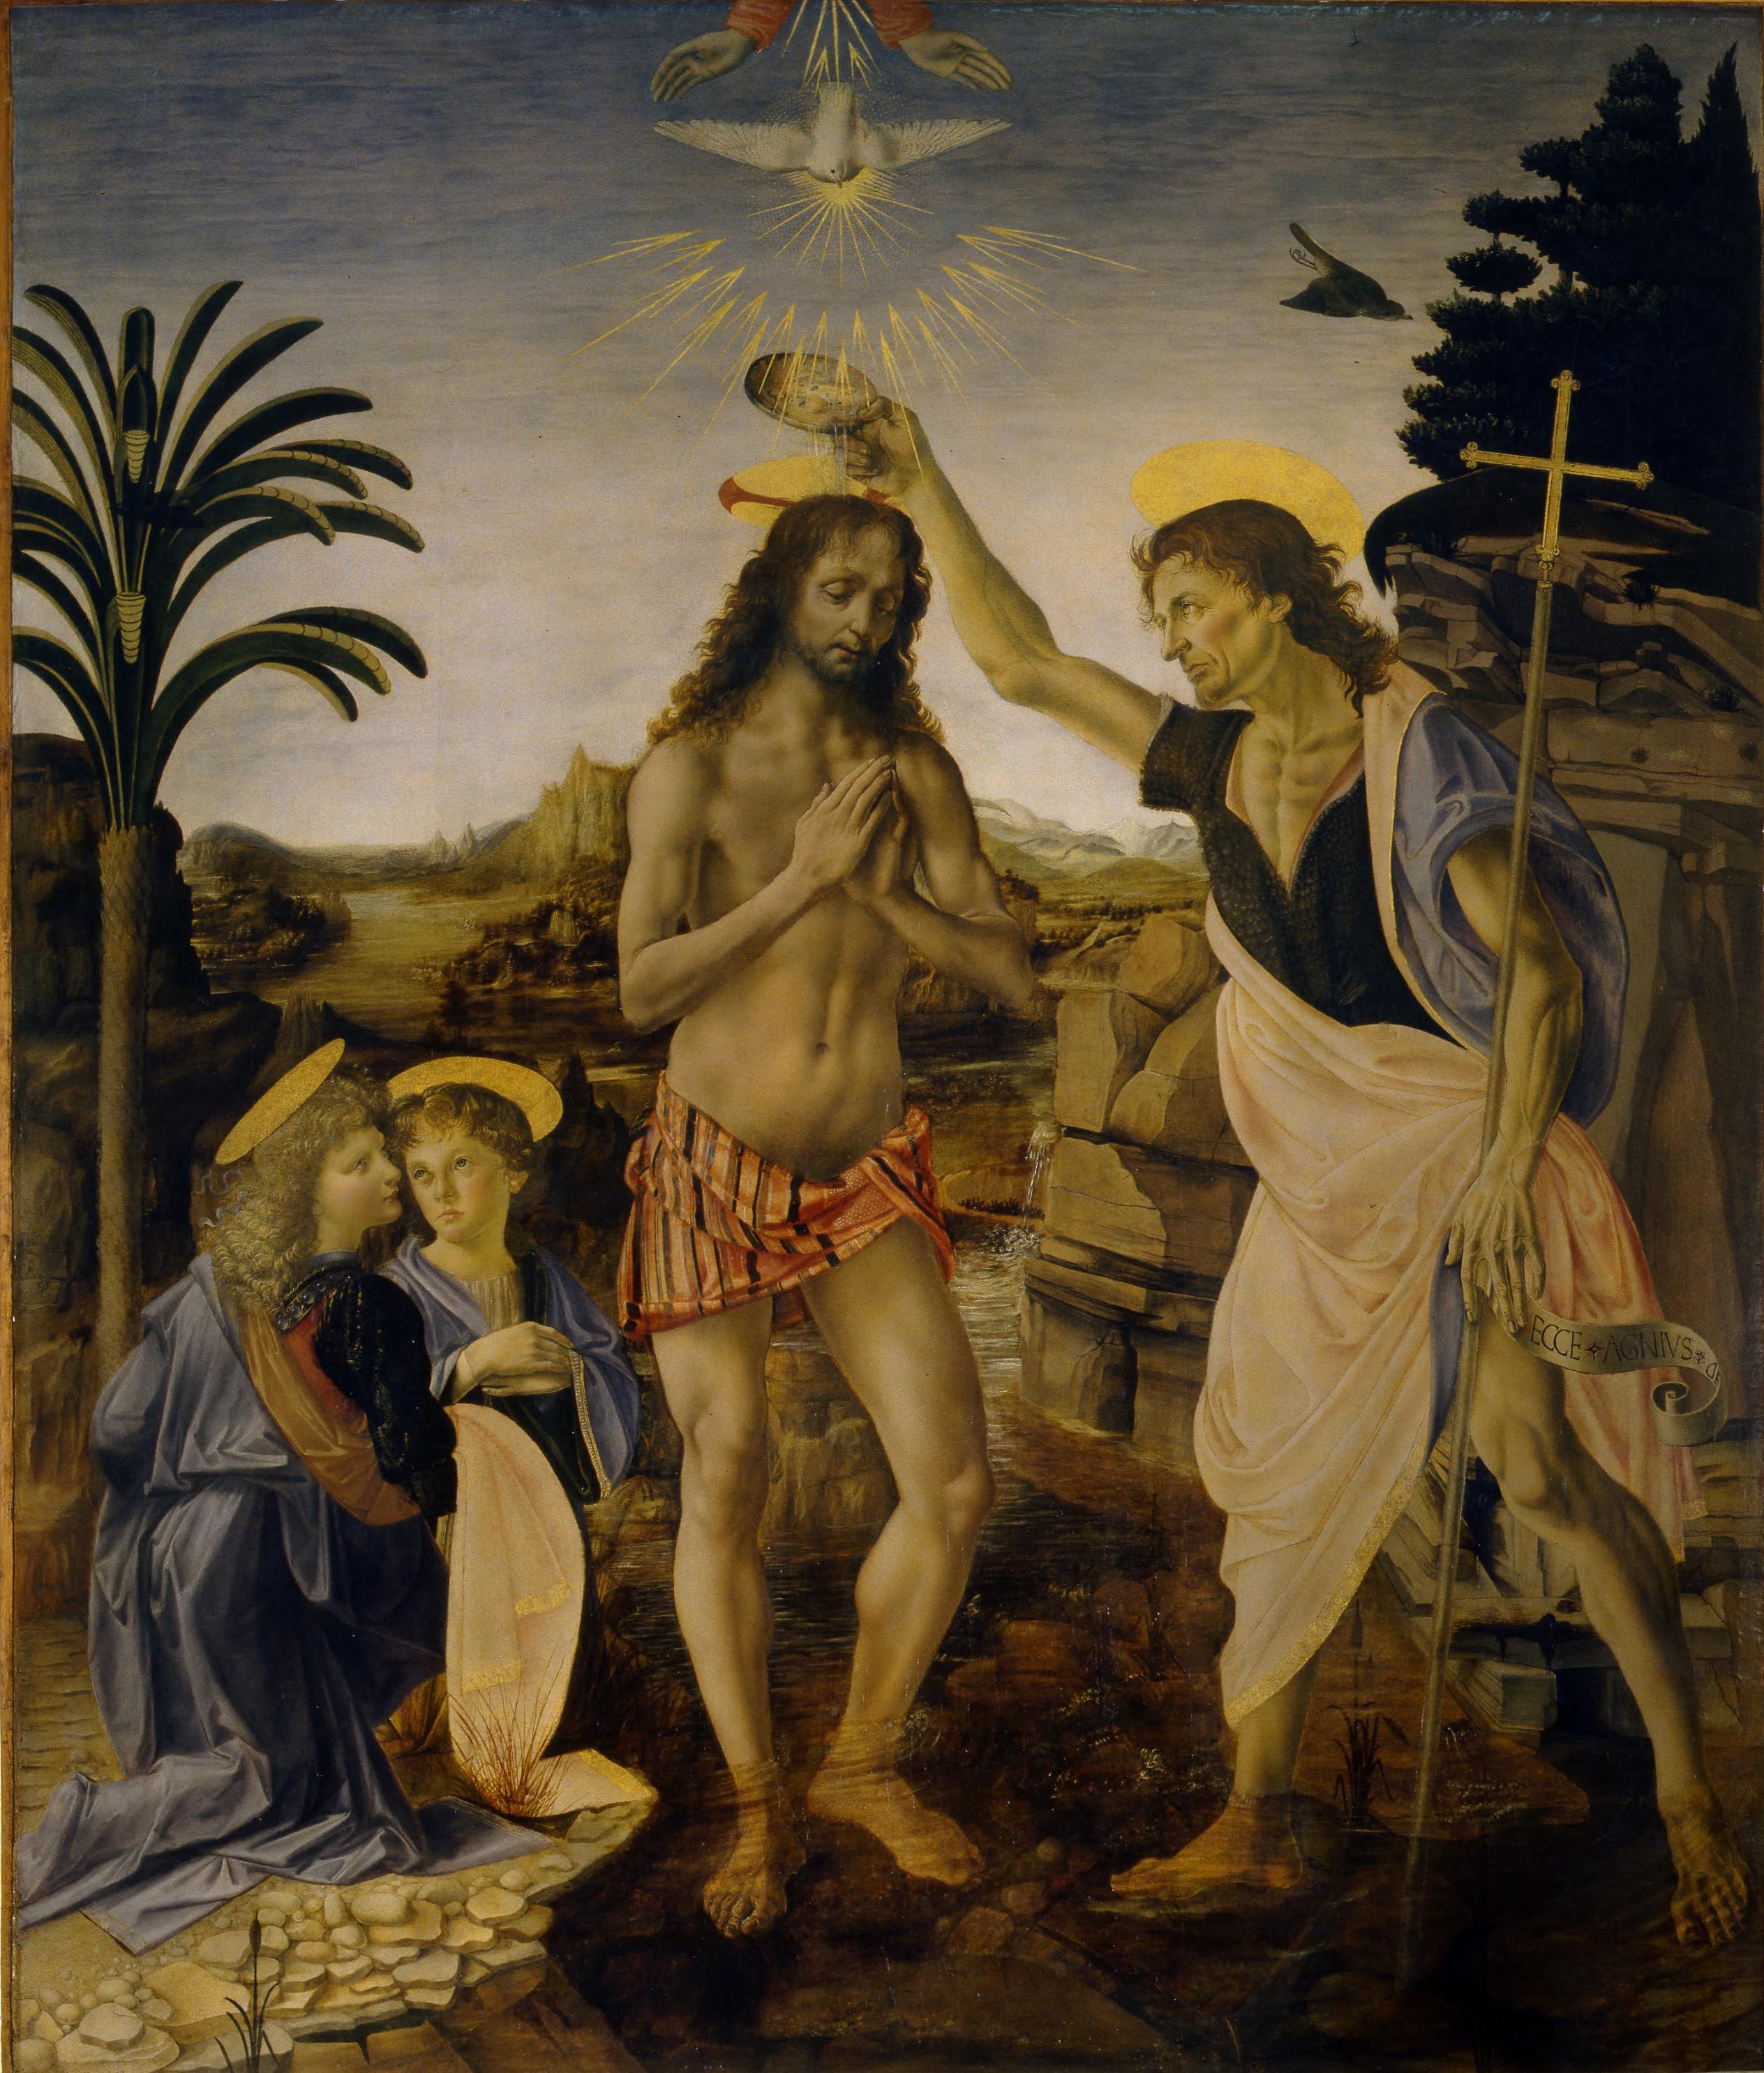 1000+ images about Galleria degli Uffizi on Pinterest ... Da Vinci Paintings Mirrored